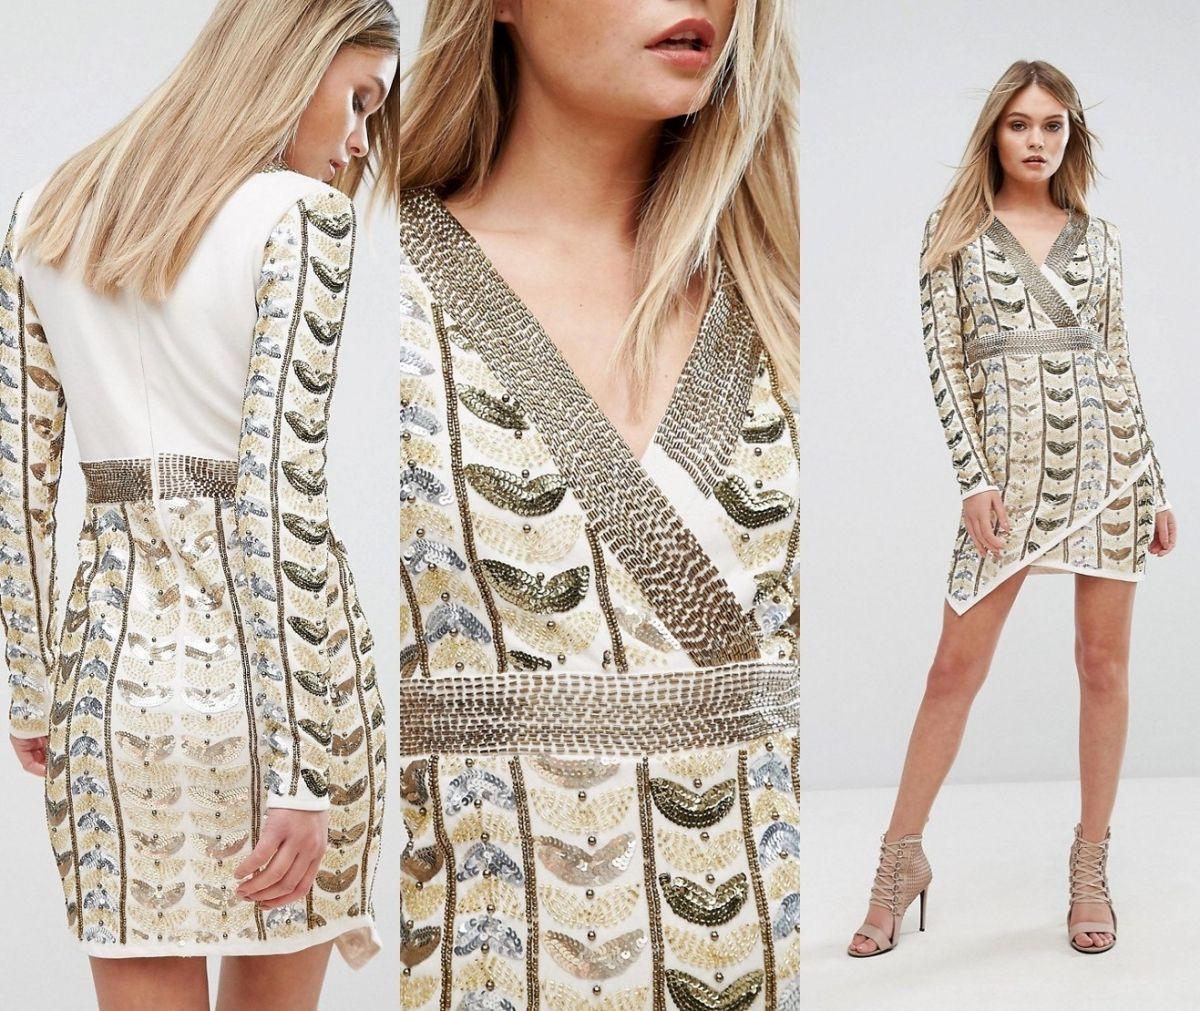 F 2 17 21 Starlet Sukienka Zdobiona Rozmiar 38 7132074309 Oficjalne Archiwum Allegro Dresses Fashion Cover Up